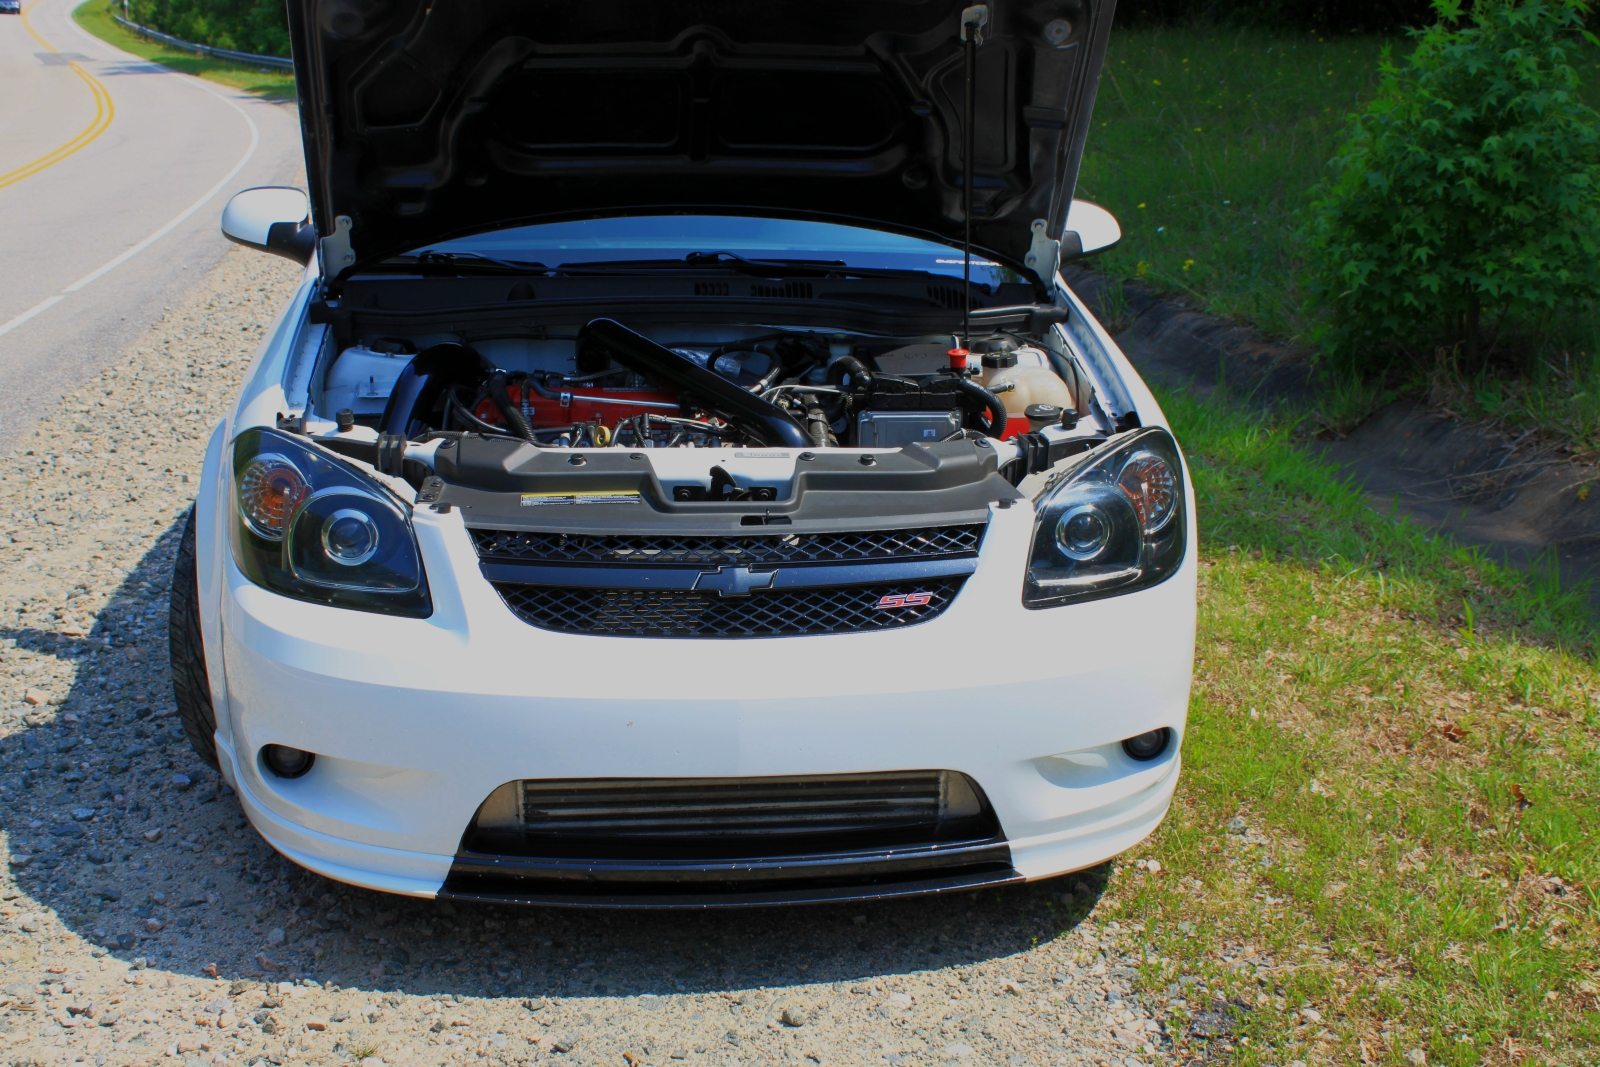 Feature Car: Matt Welliver's Cobalt Turbo Sedan